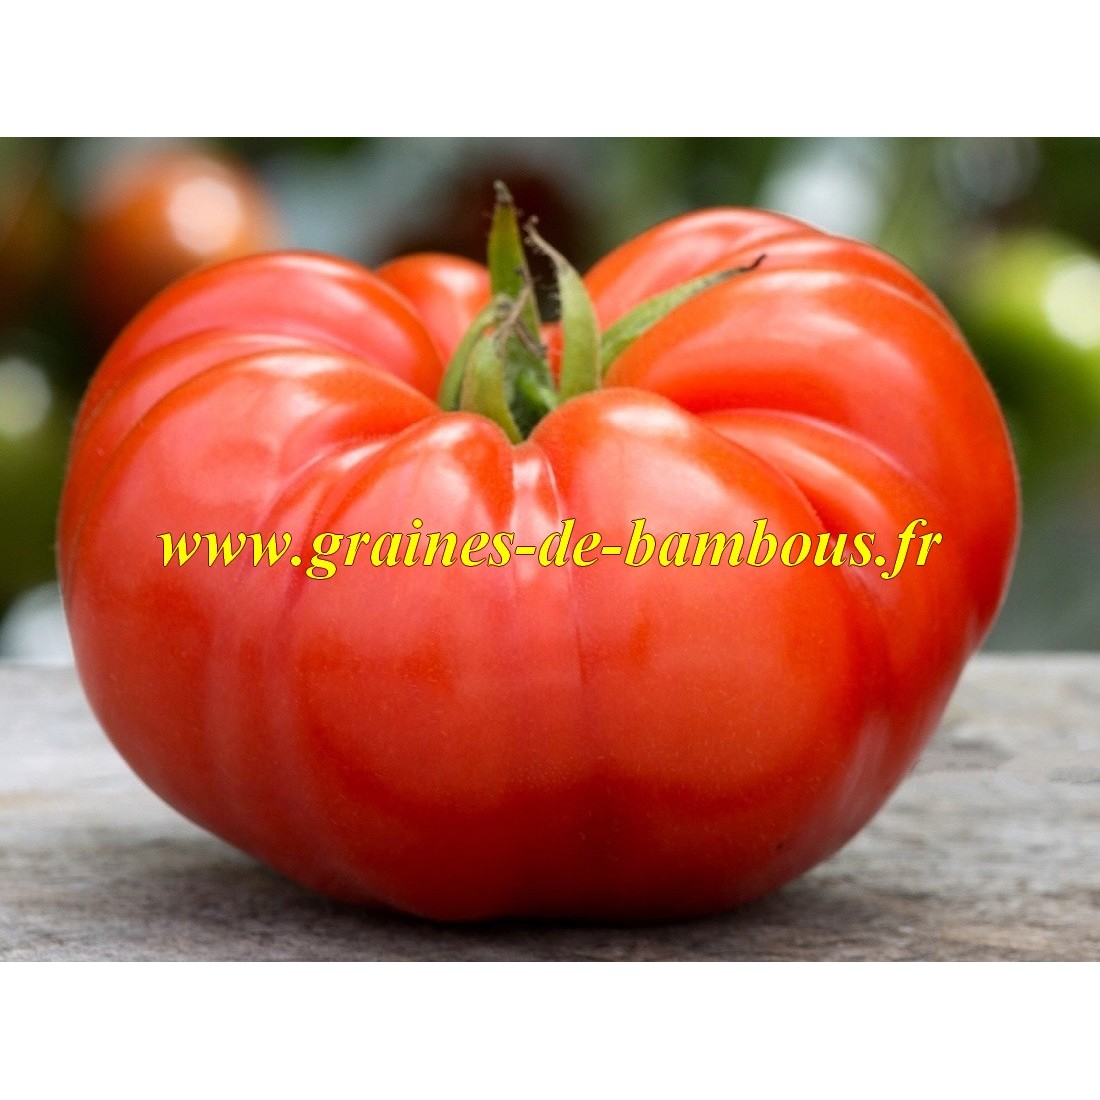 Tomate coeur de boeuf beefsteak graines